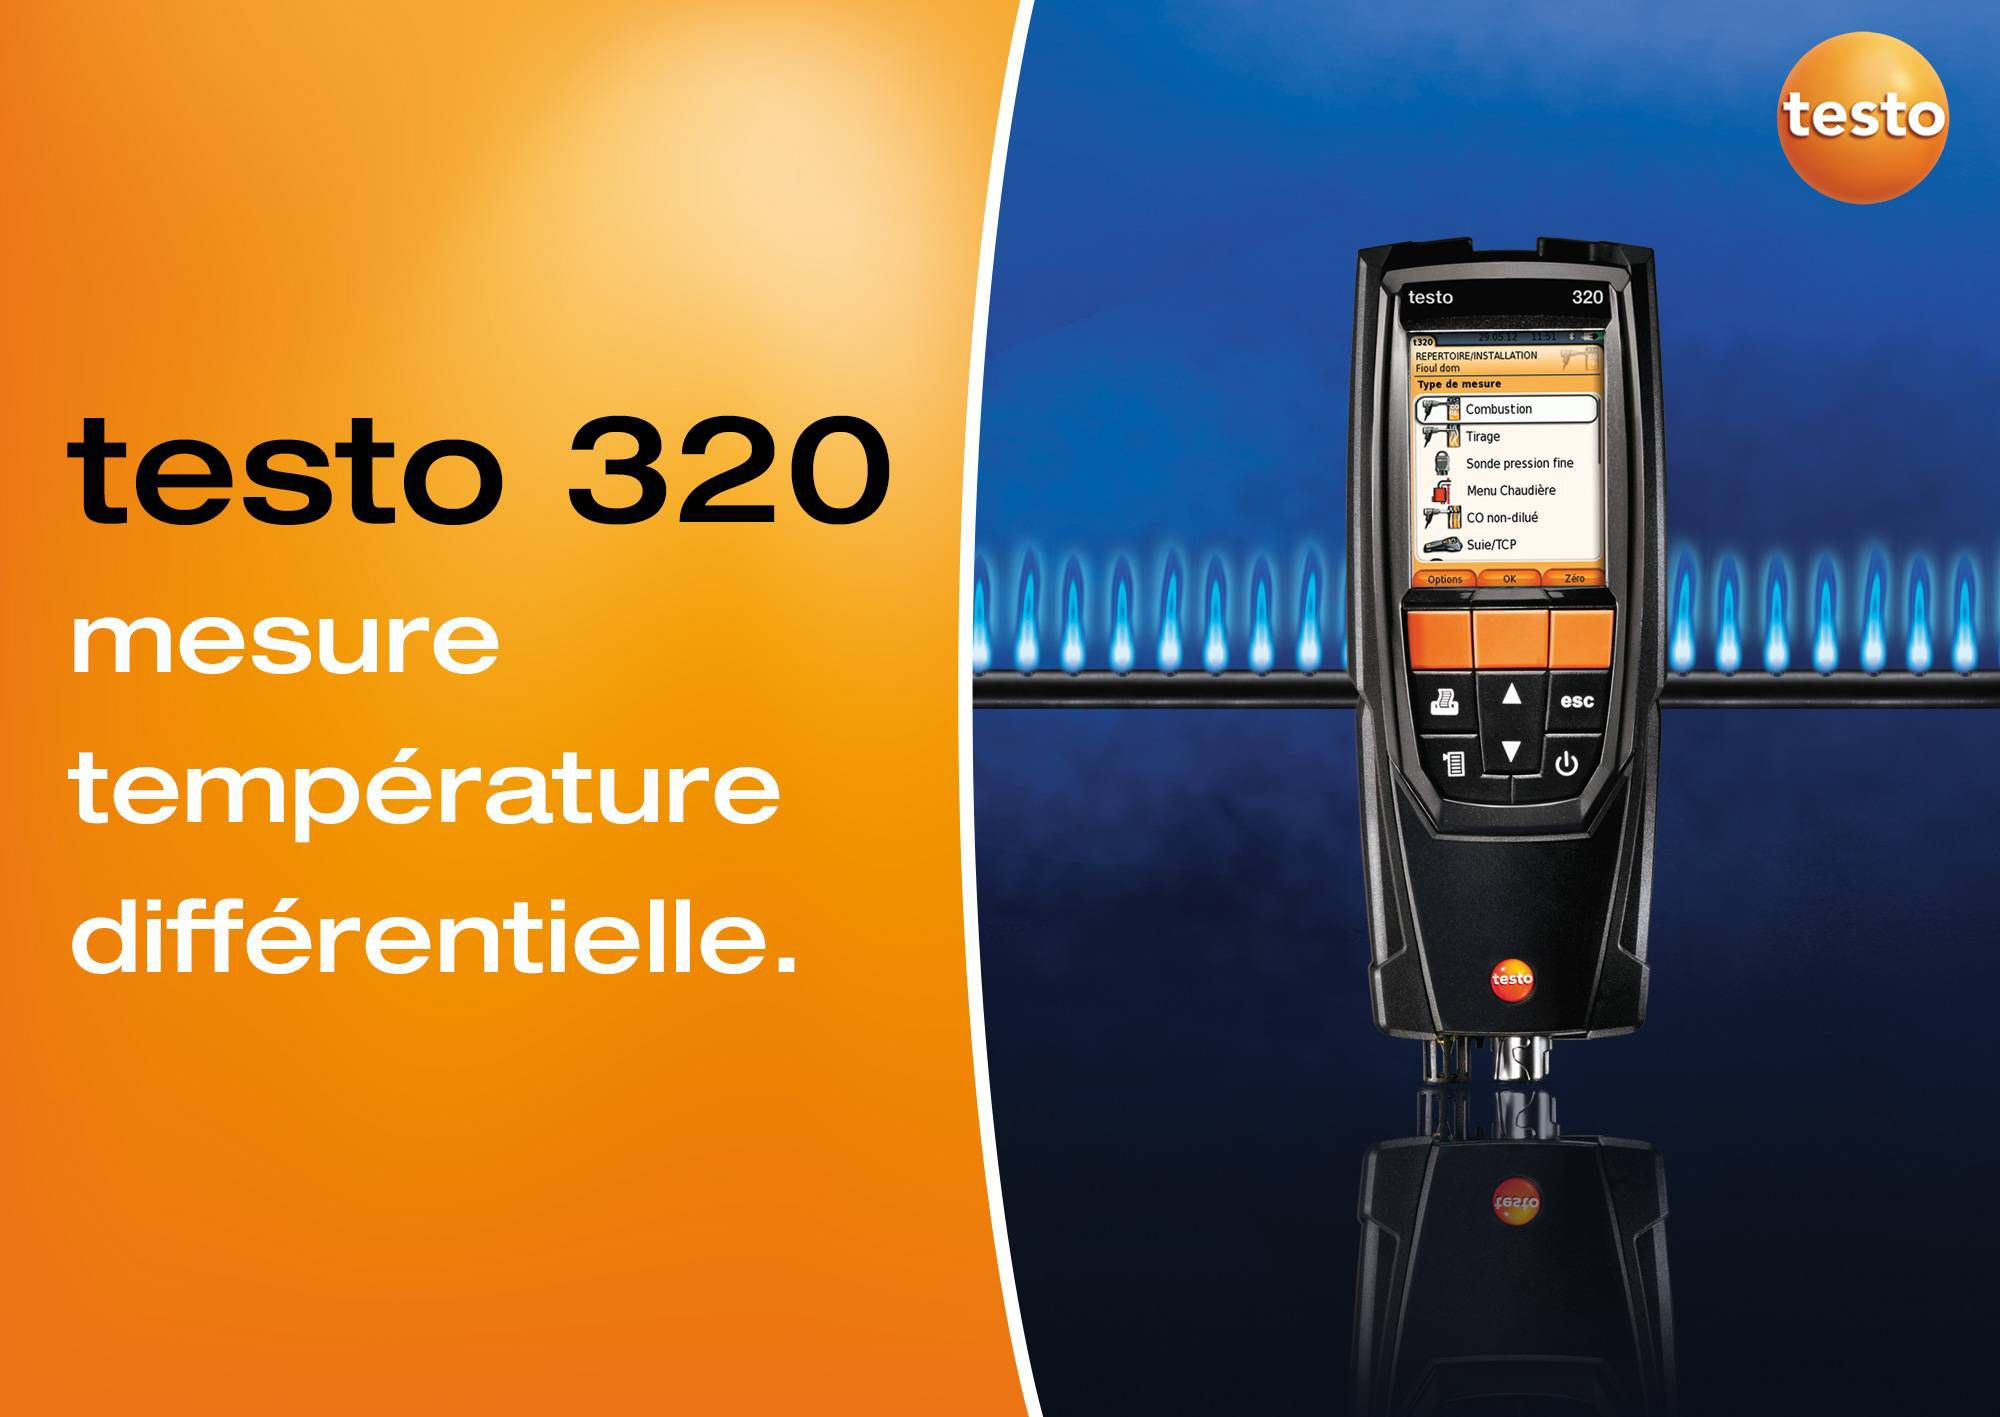 tutoriel vidéo mesure de la température différentielle testo 320